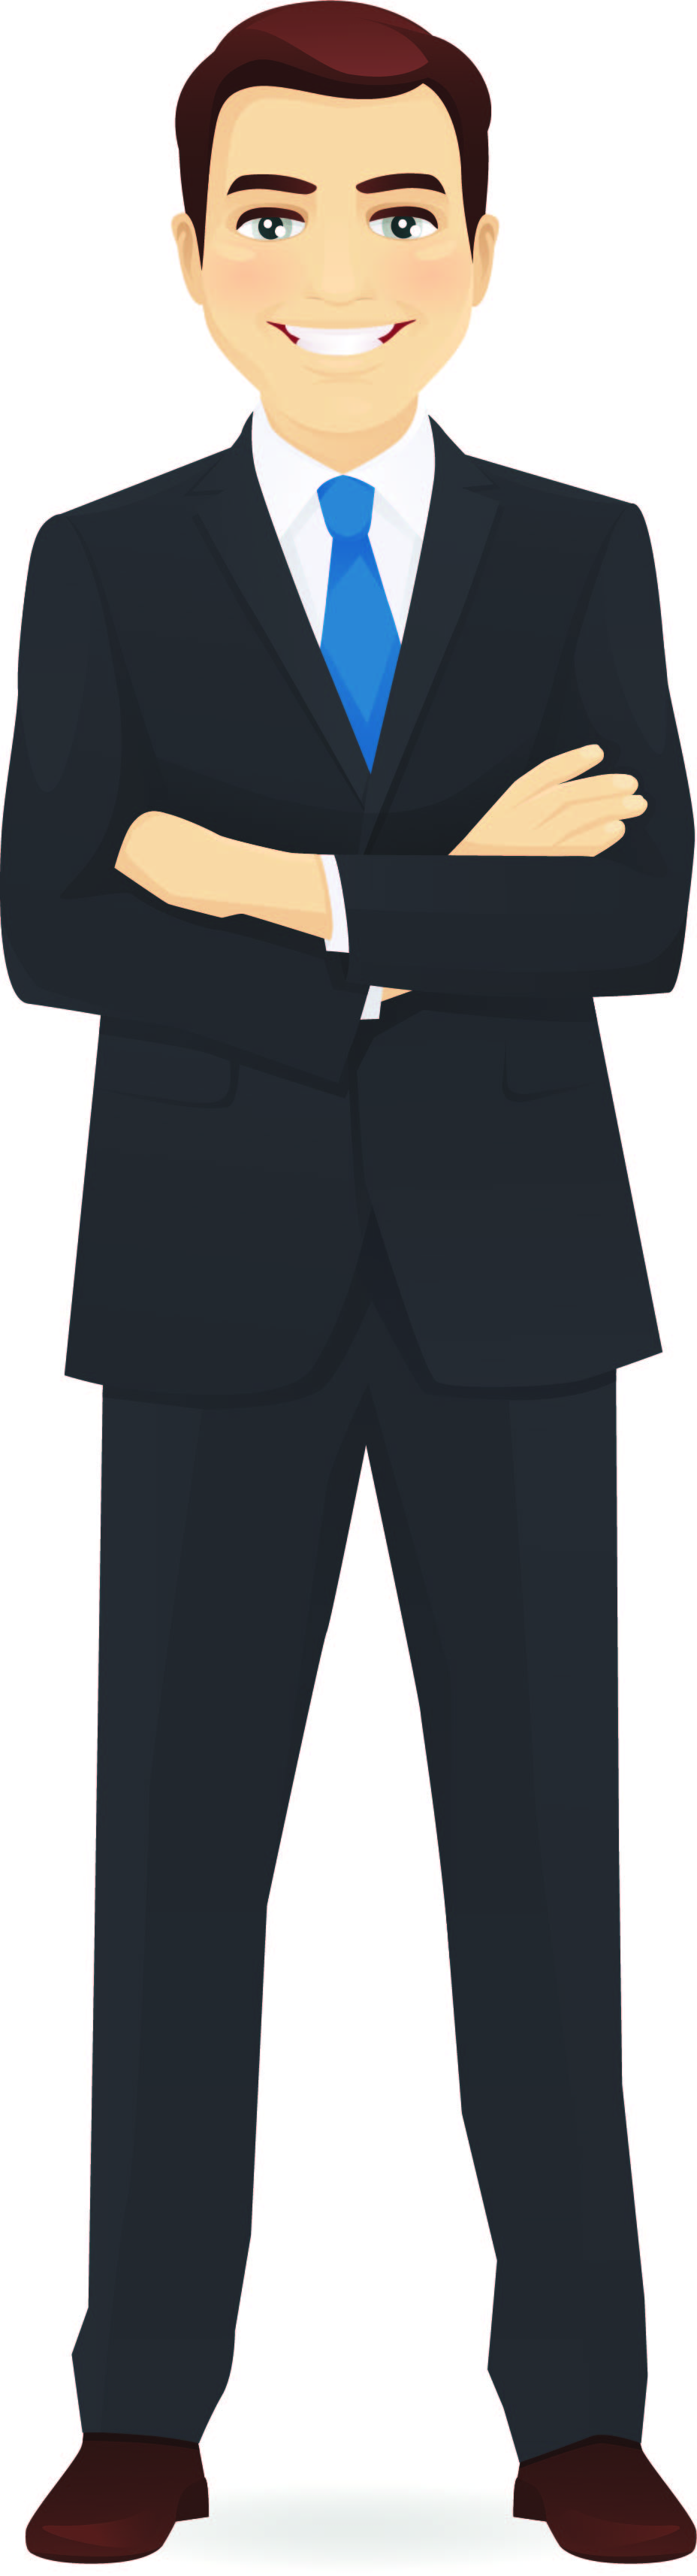 Businessman.jpg